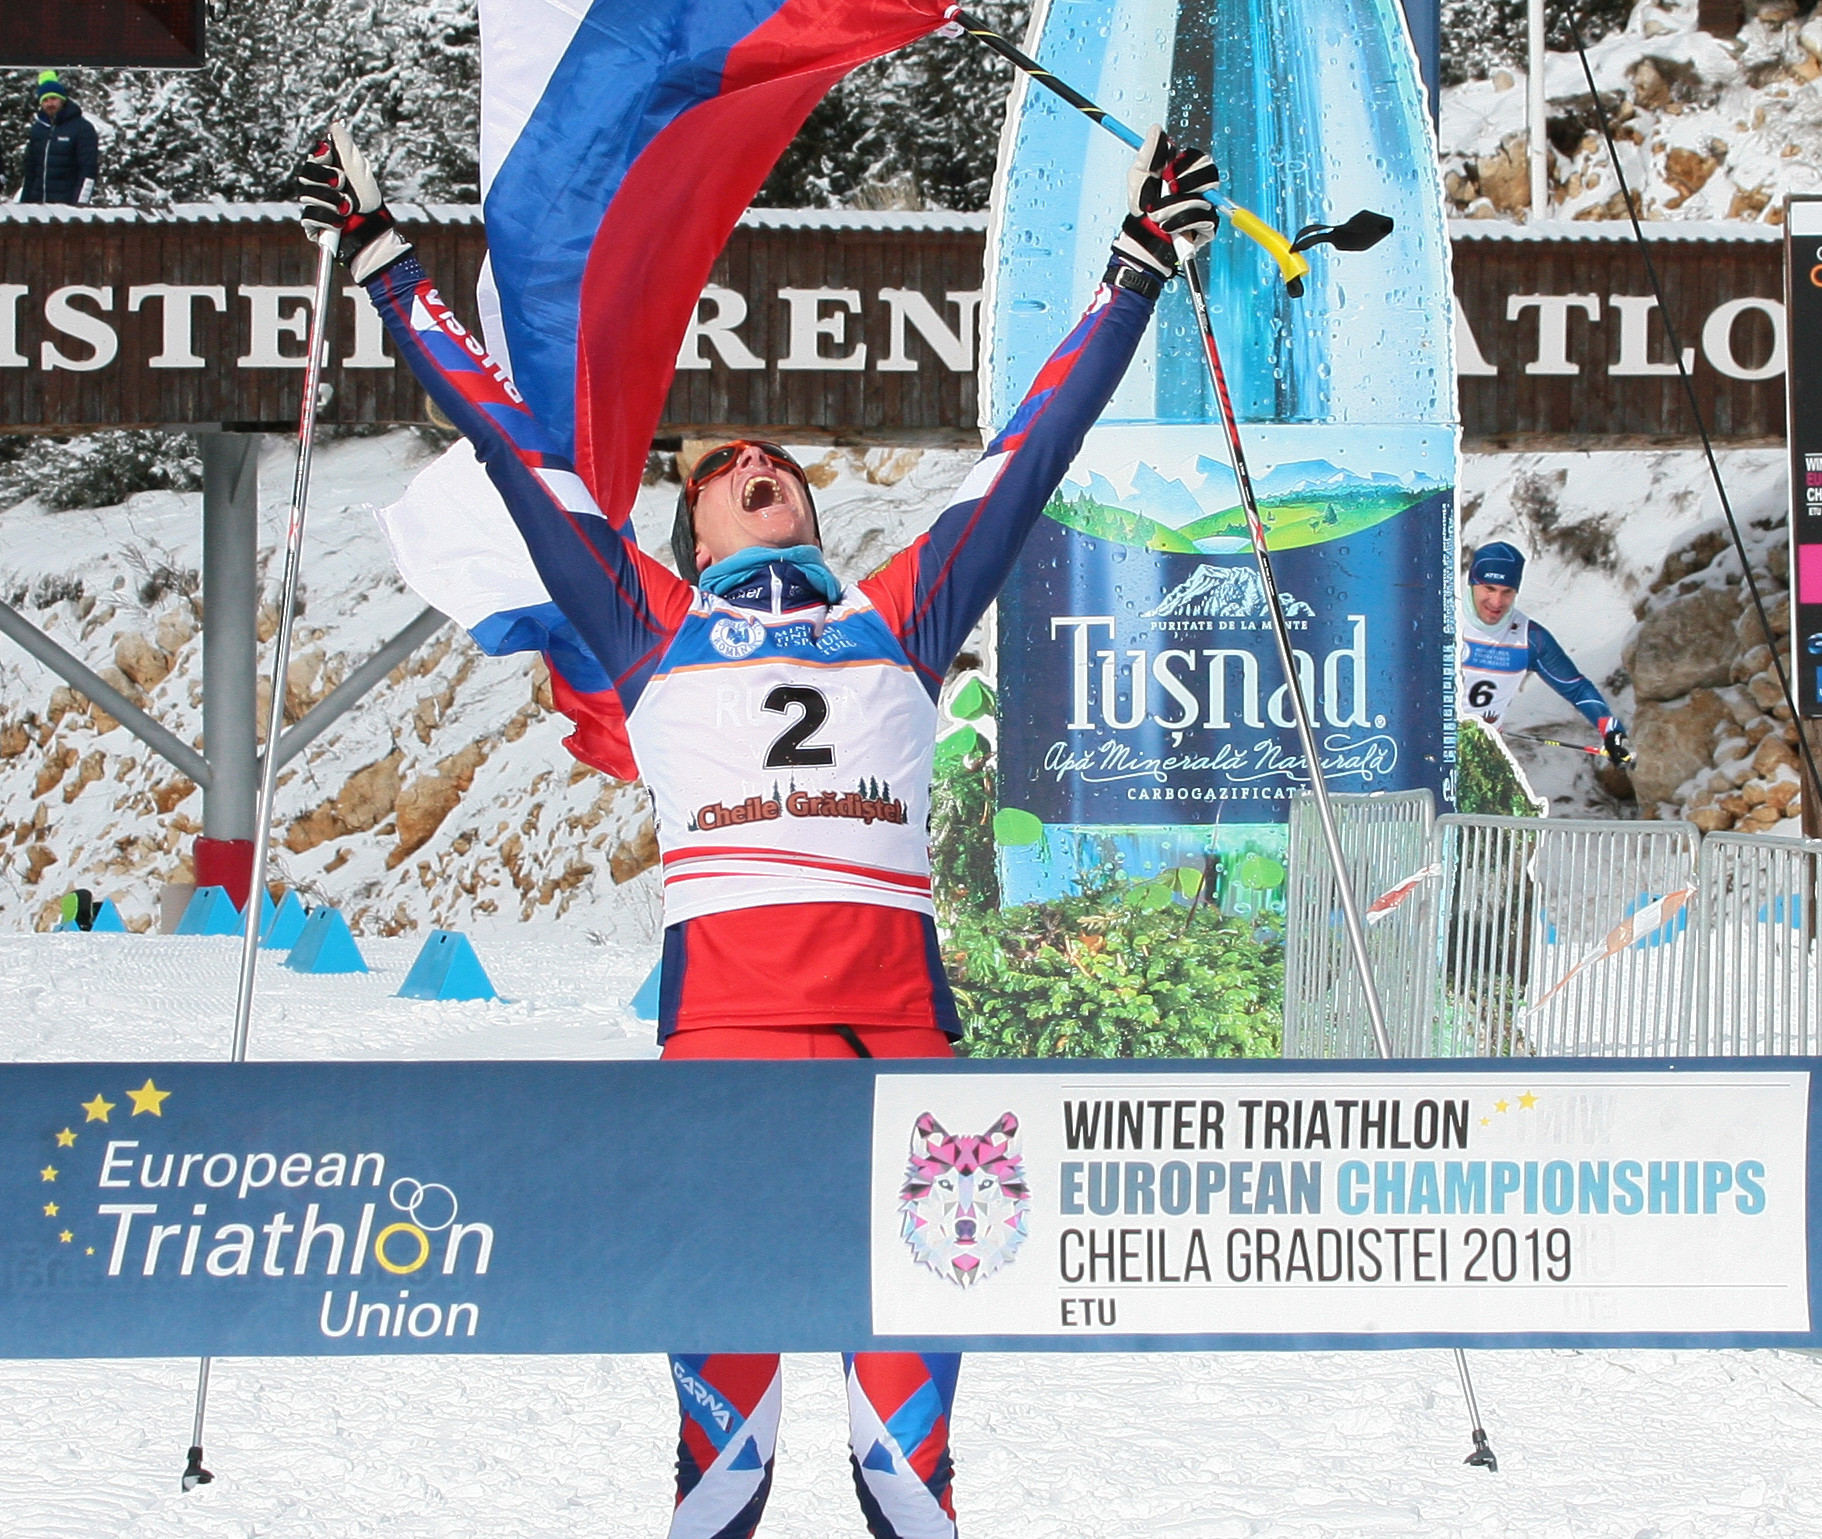 The Winter Triathlon European Championships in Cheile Gradistei in Romania will launch the ETU season in 2020 ©ETU